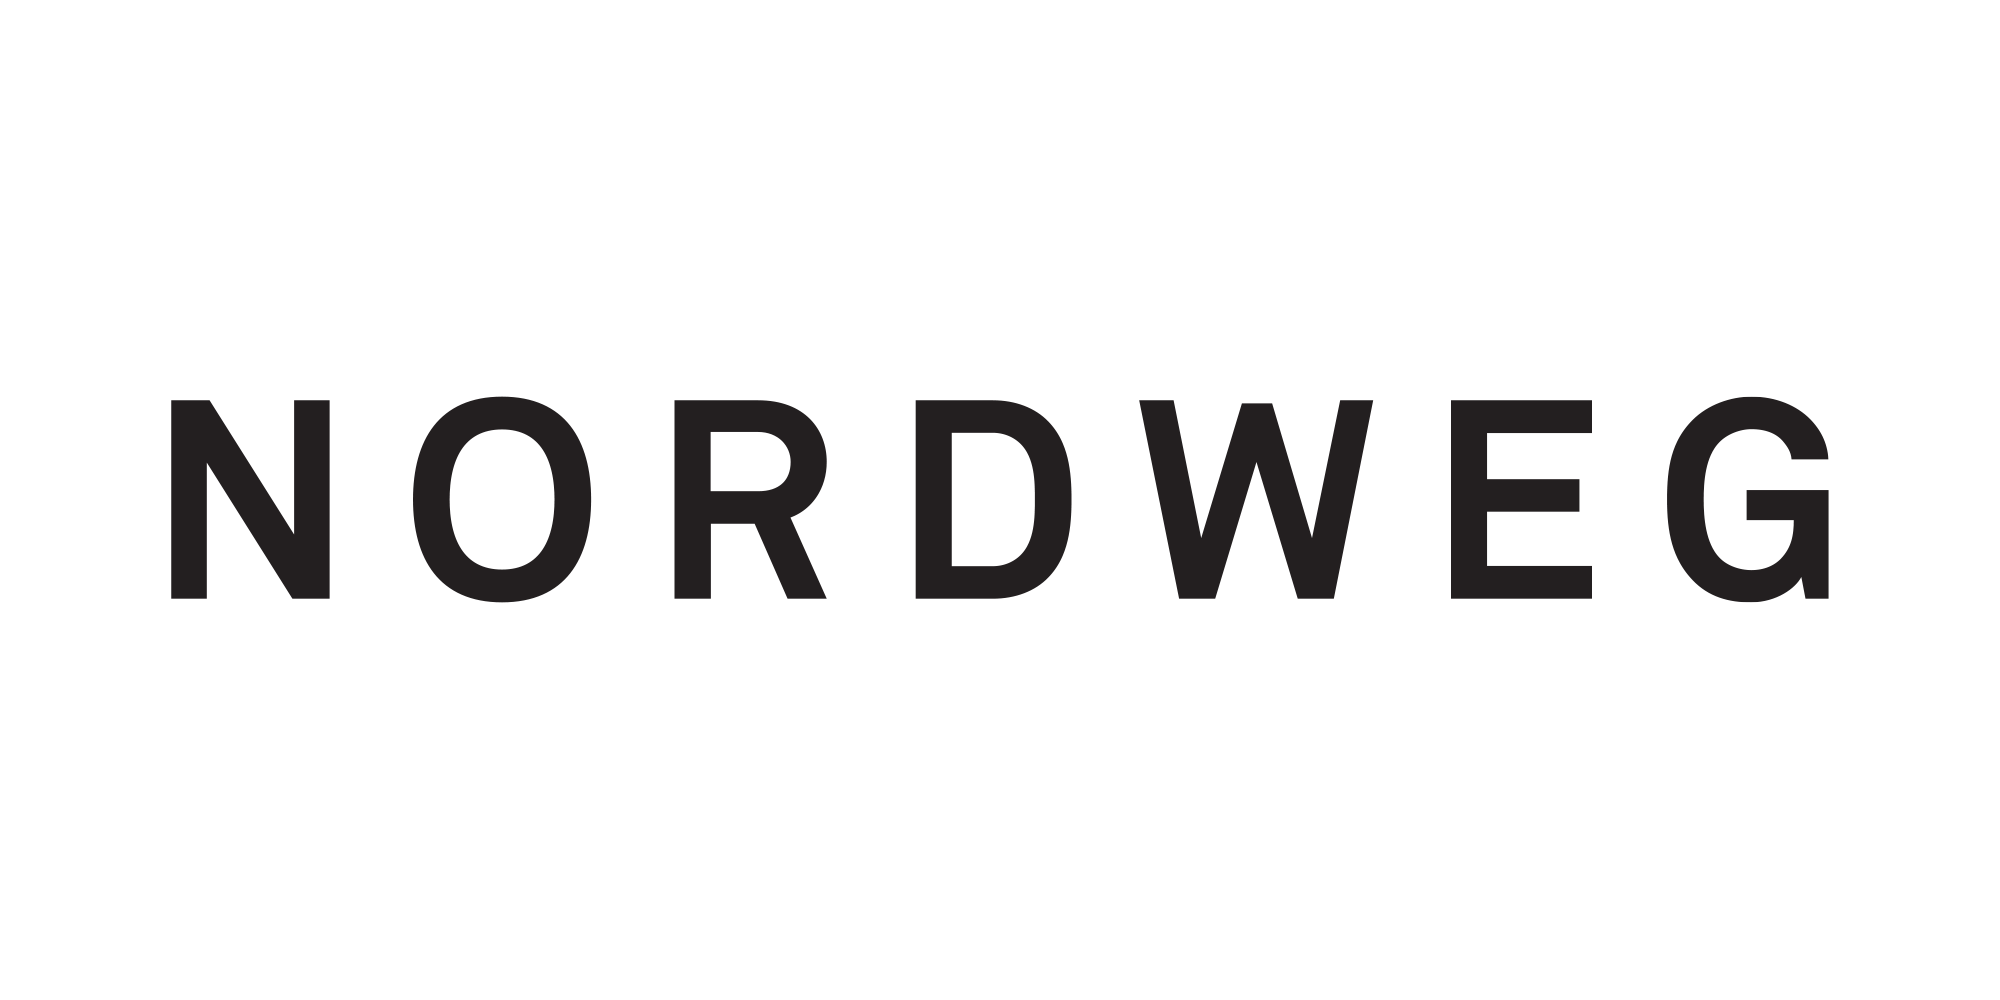 https://www.viabag.com.br/loja/busca.php?loja=655317&palavra_busca=Nordweg